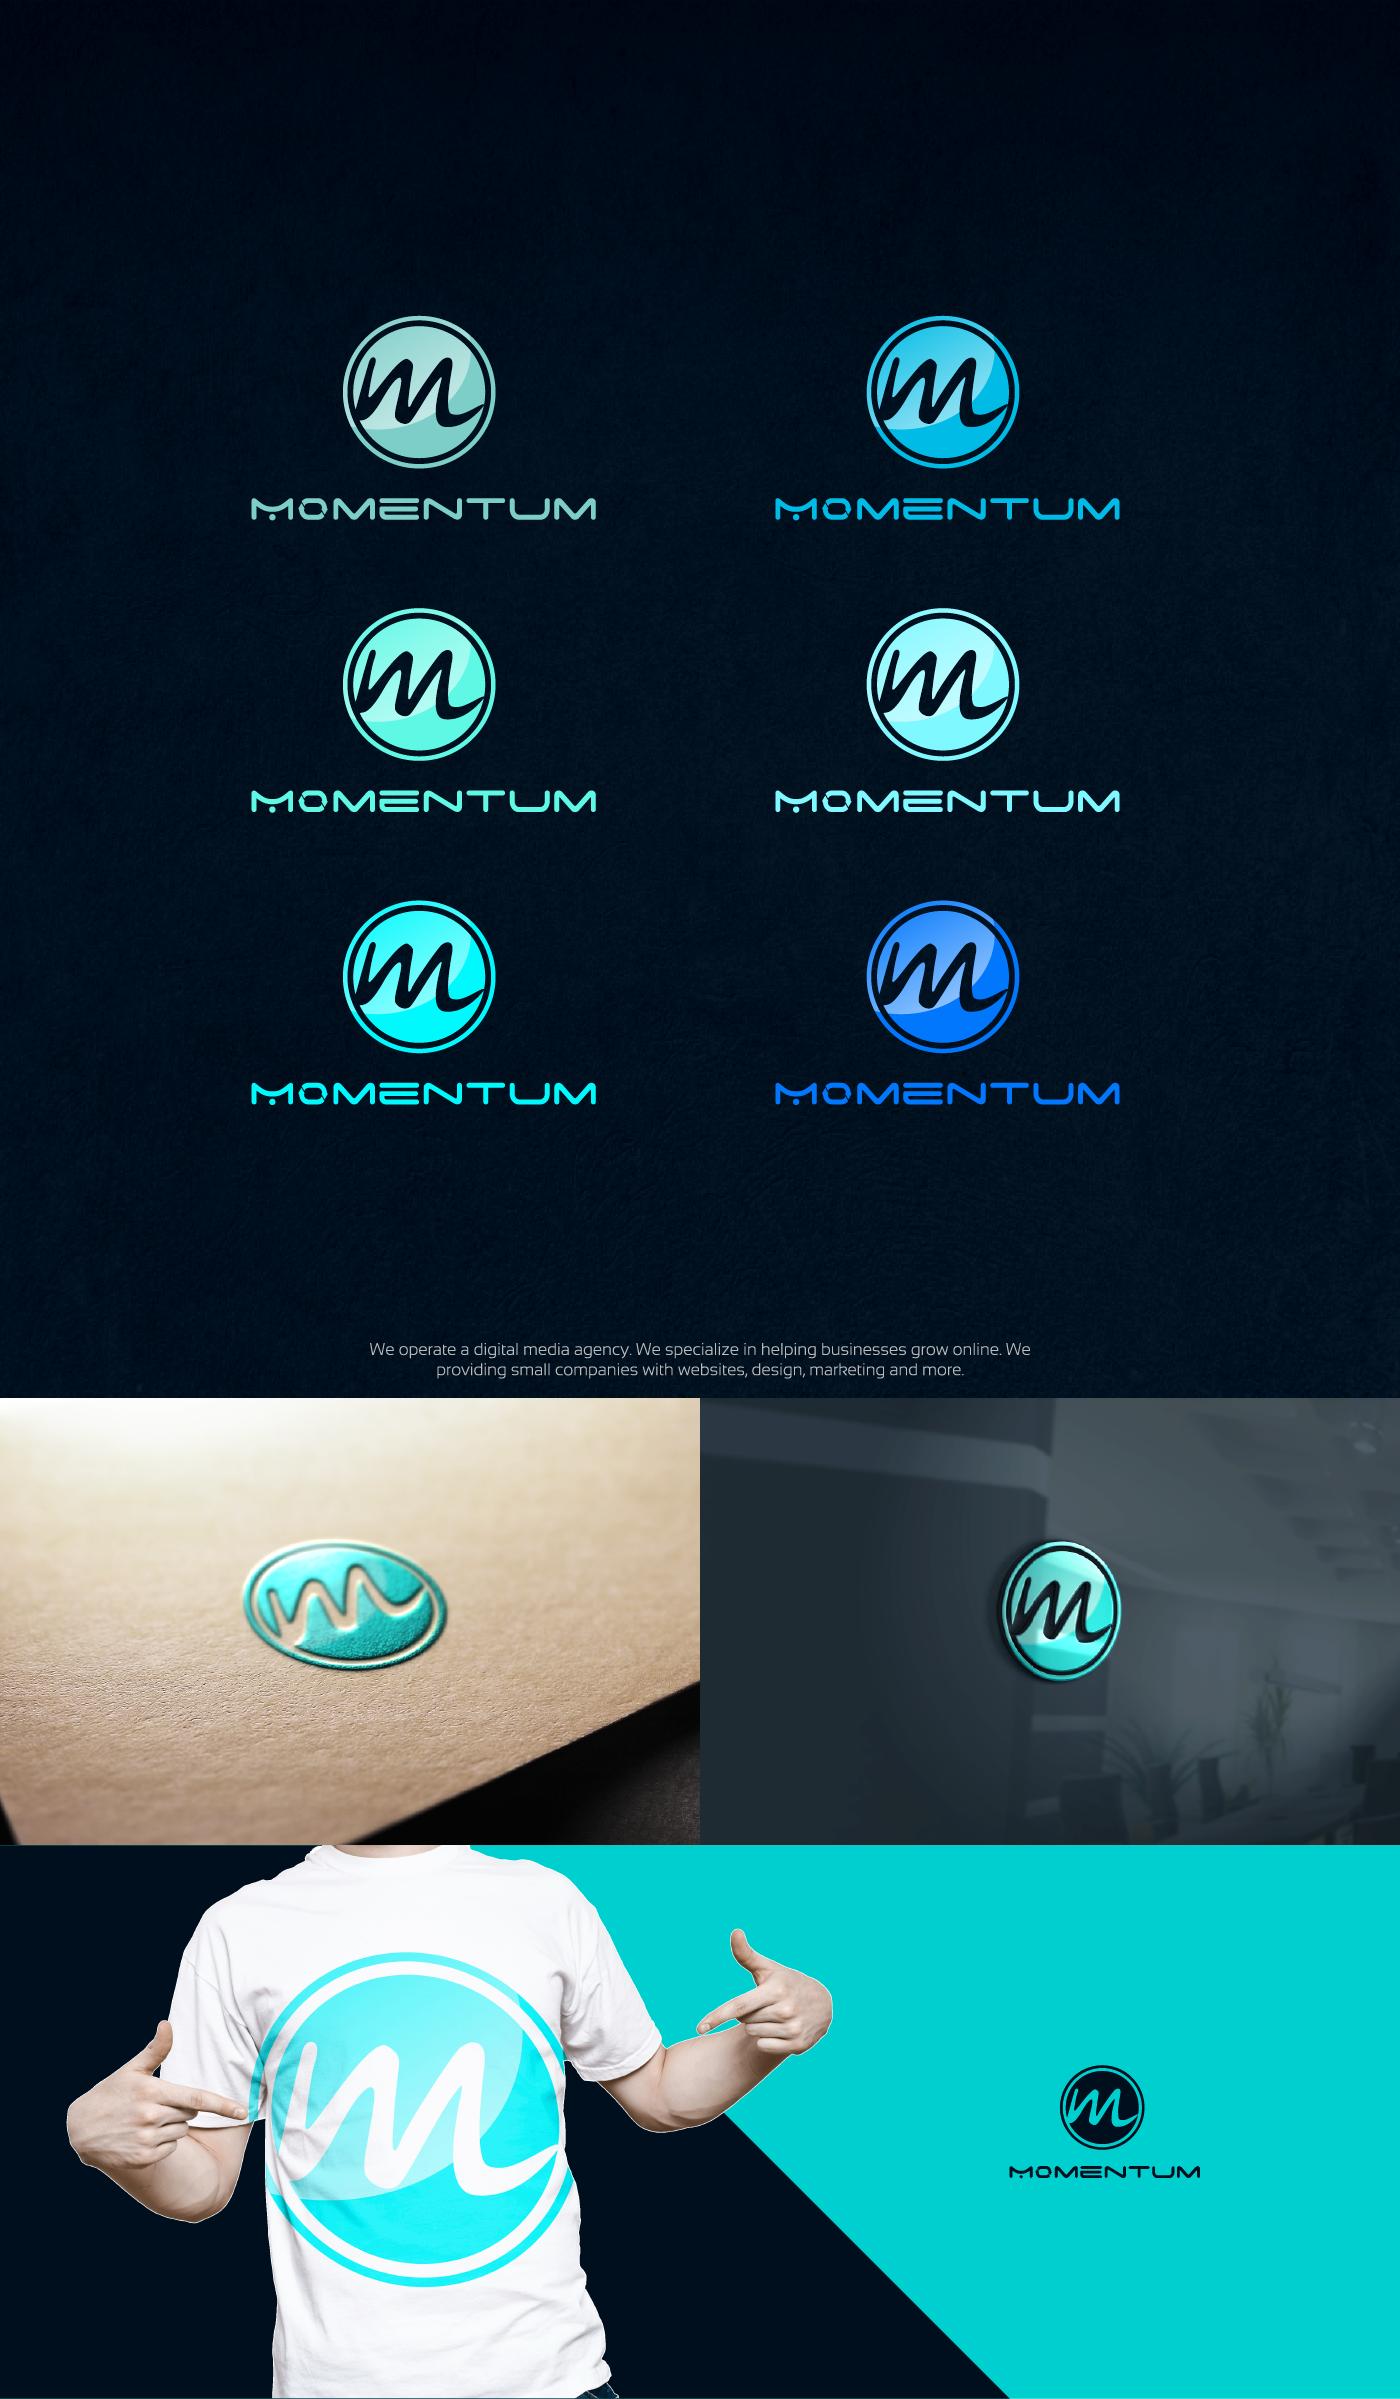 Momentum Digital image 2